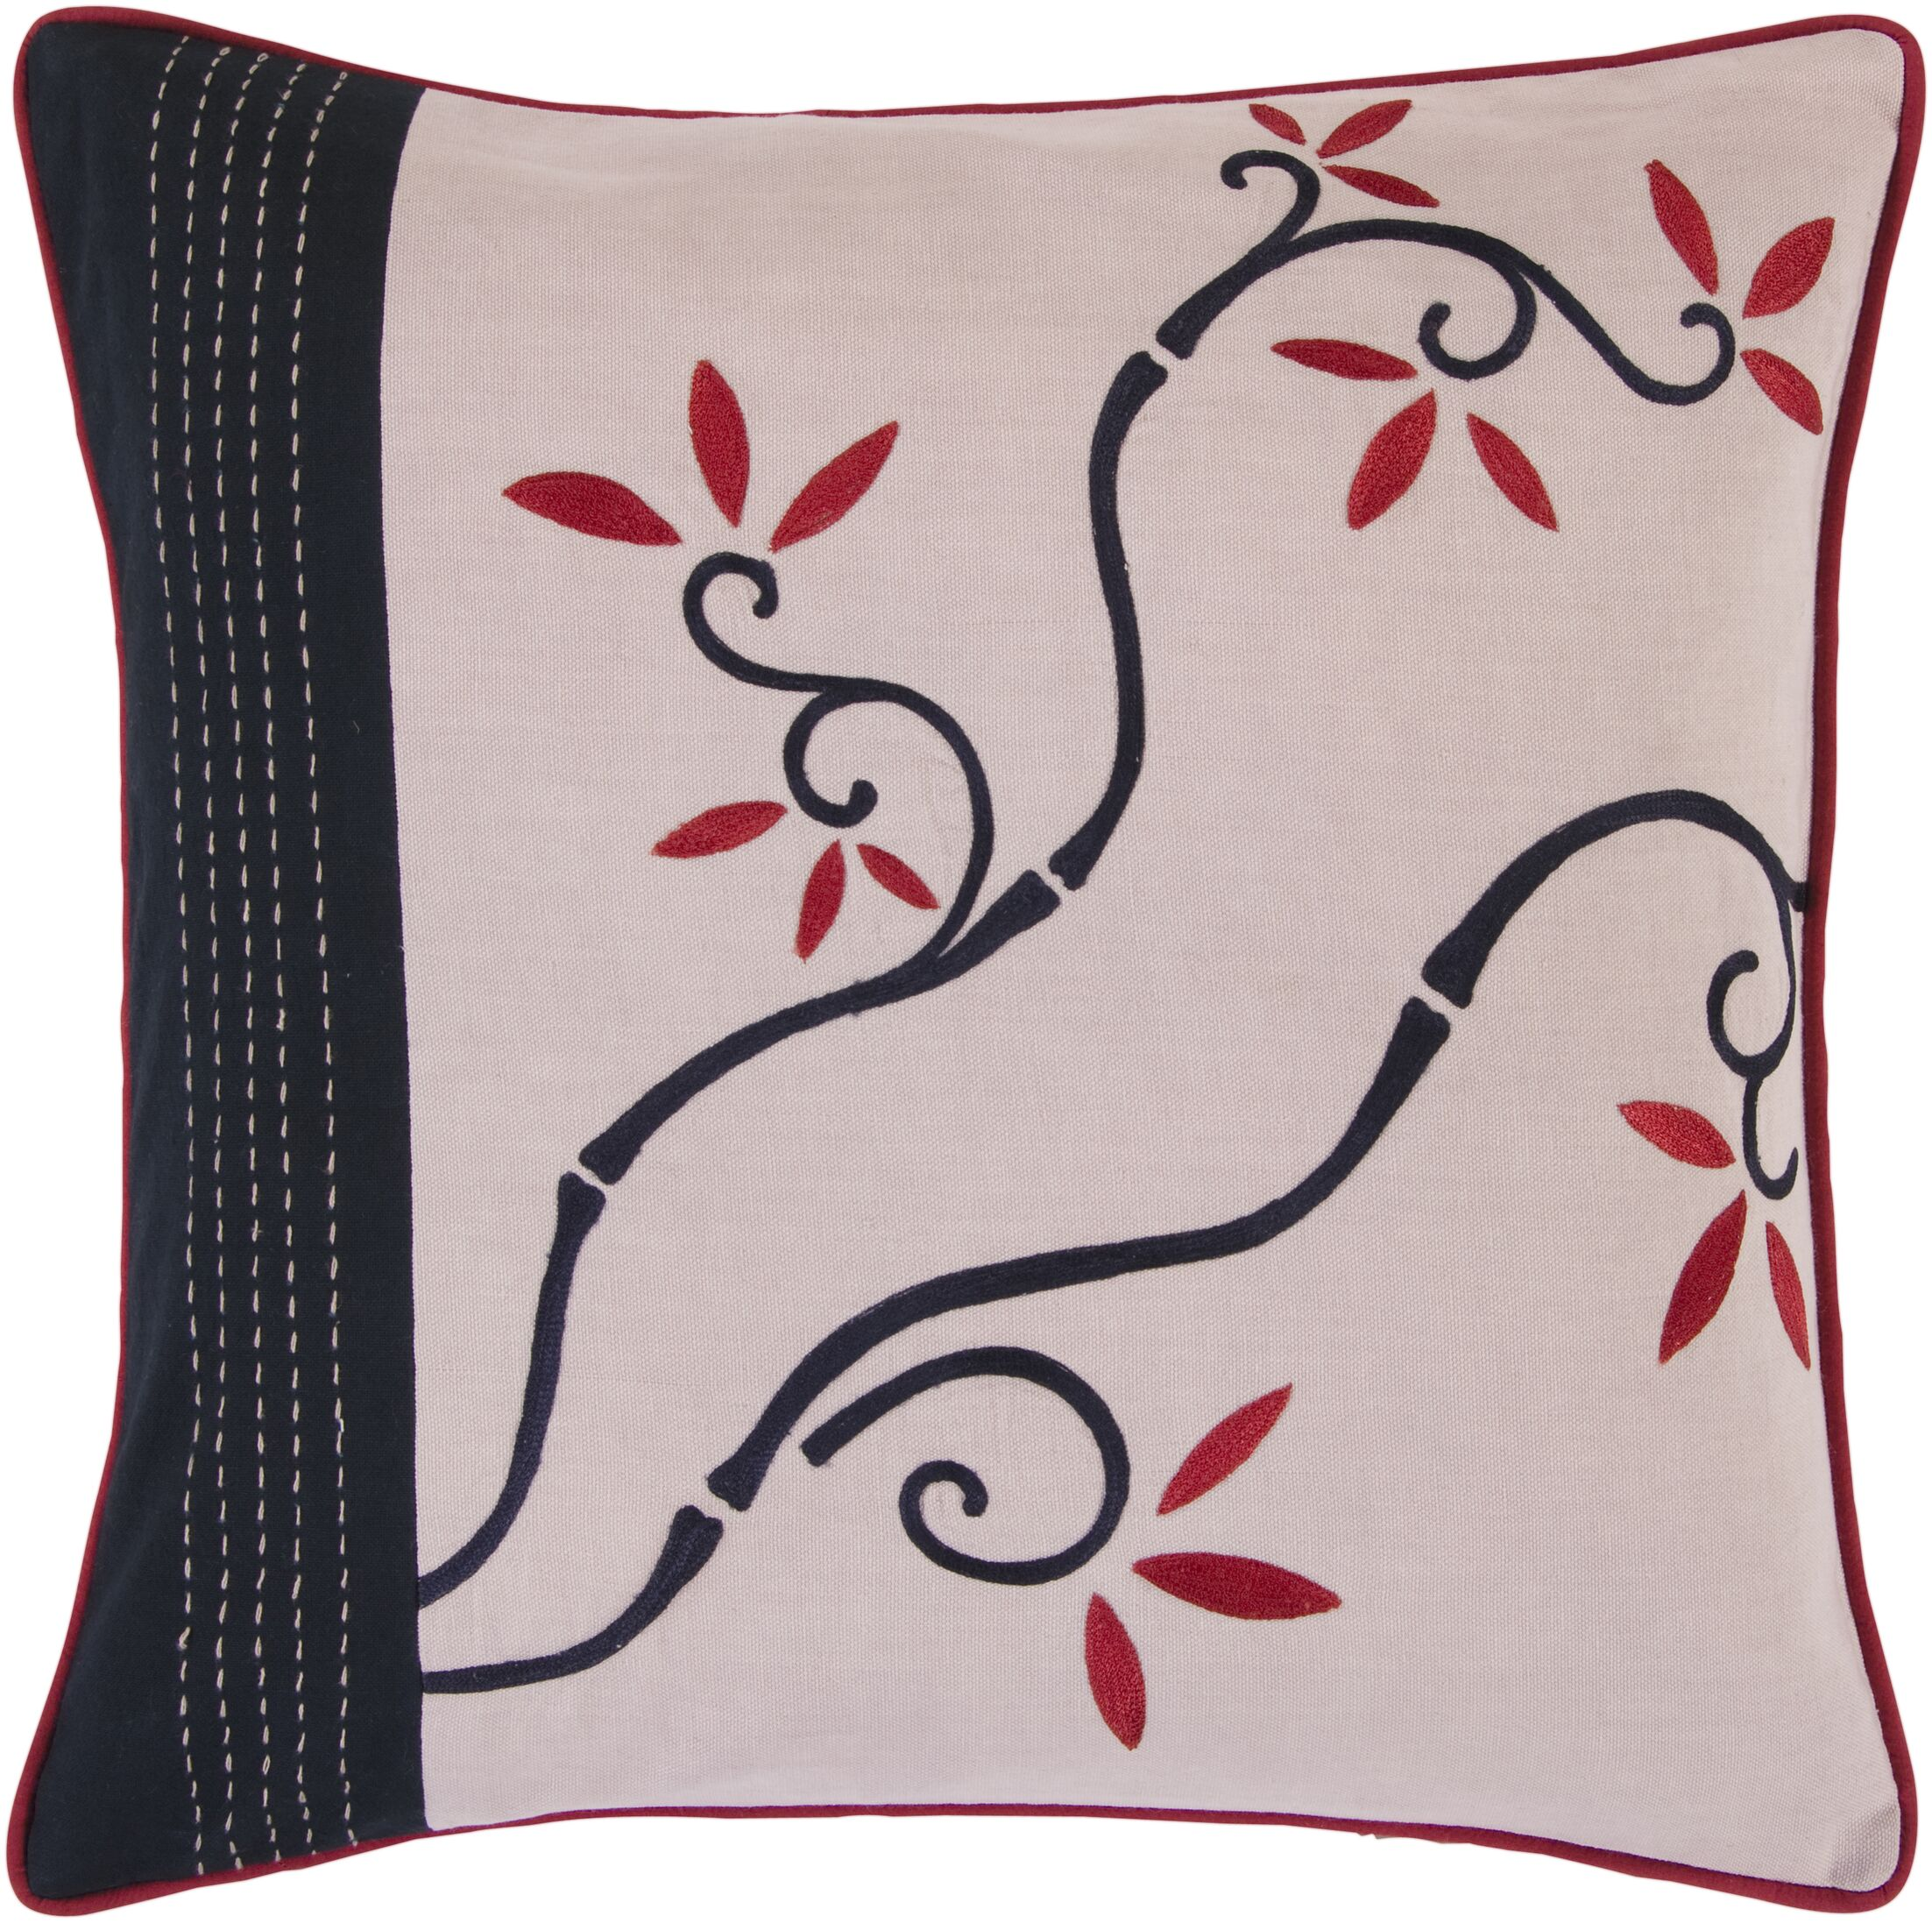 Crosby Vibrant Vine Pillow Filler: Down